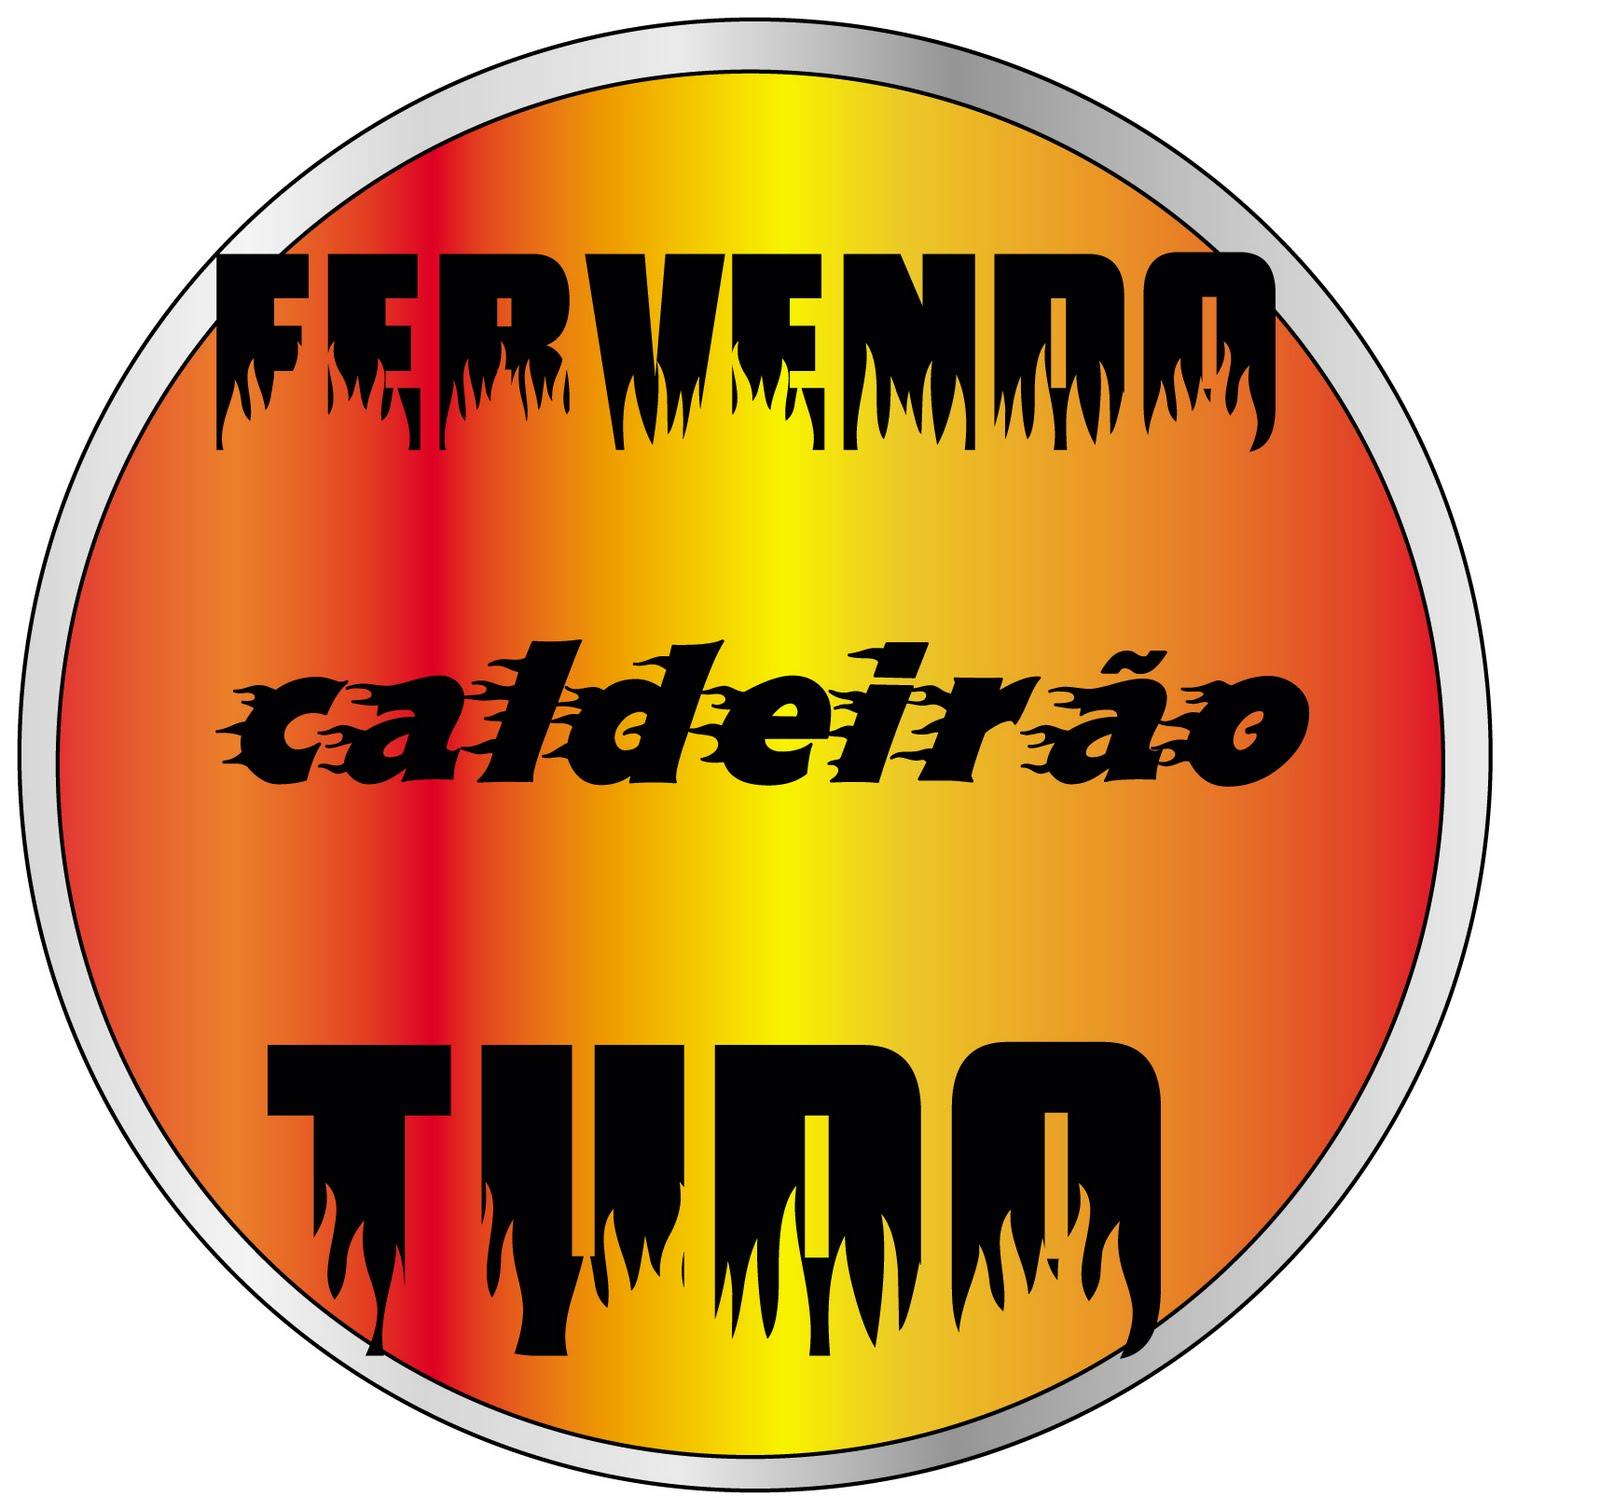 Fã Clube FERVENDO TUDO